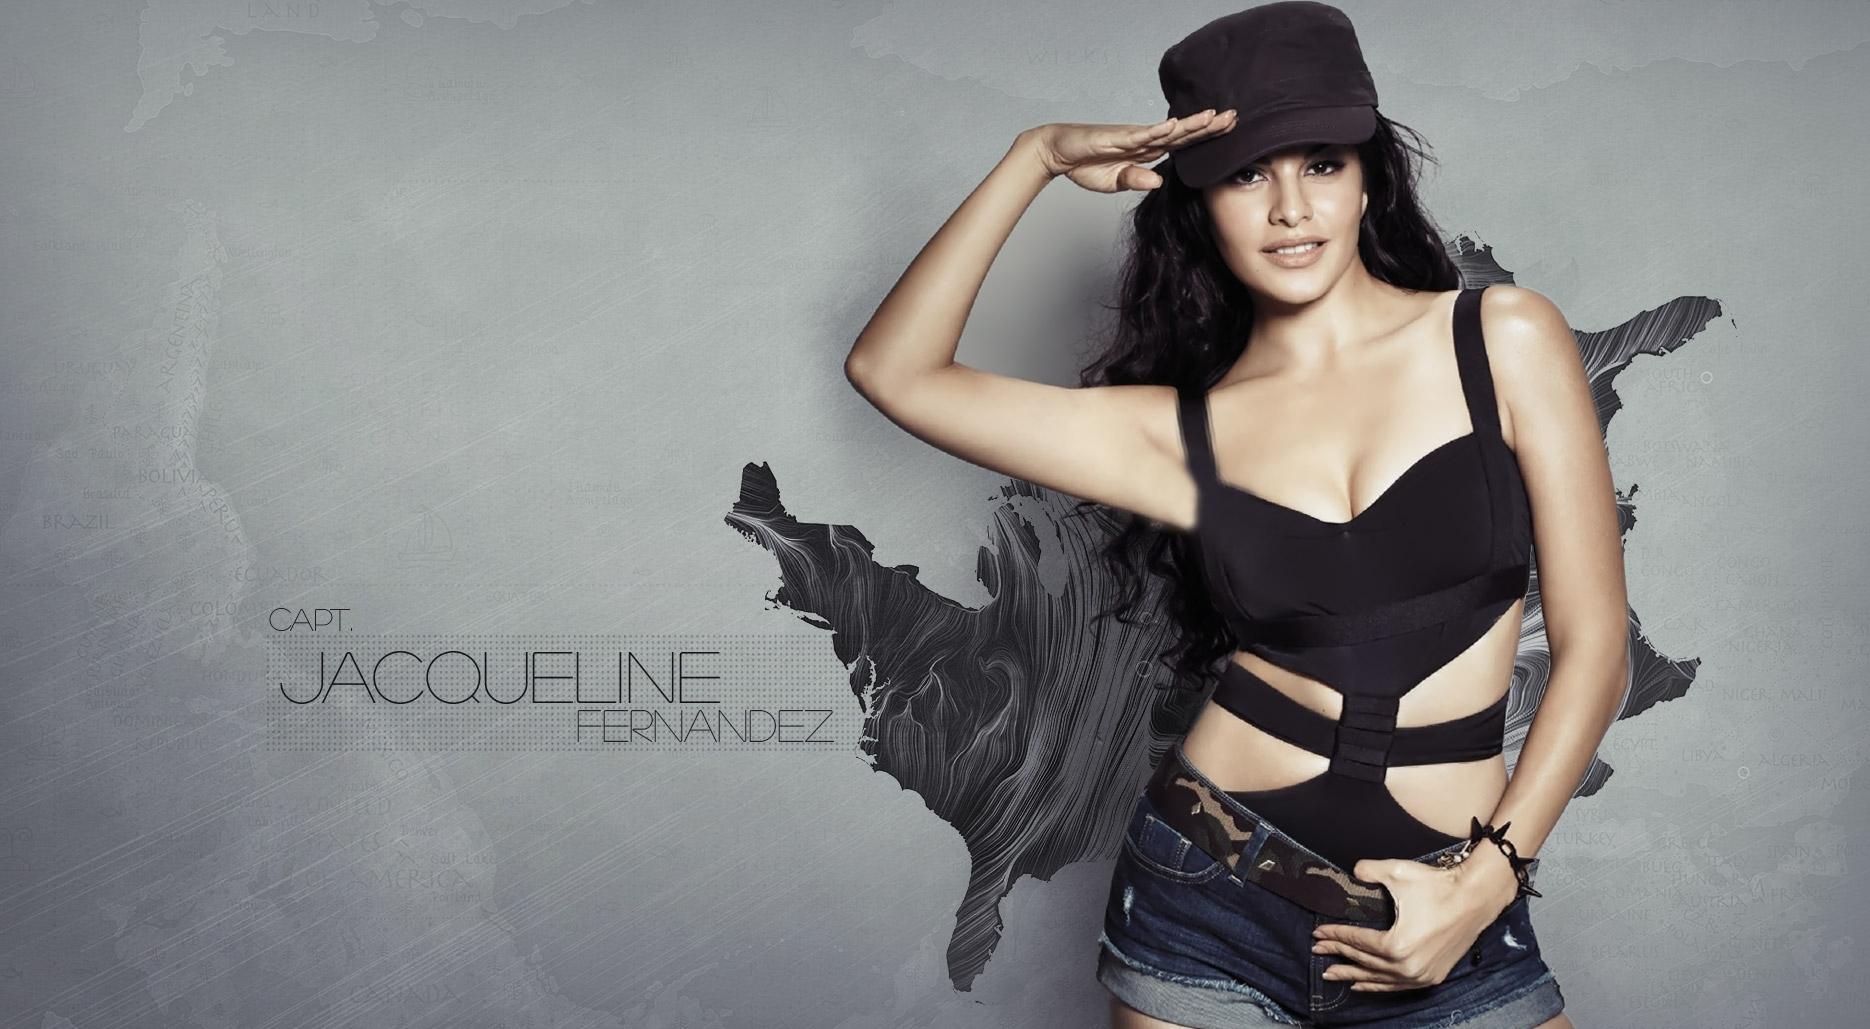 jacqueline fernandez in black cap photoshoot, full hd wallpaper